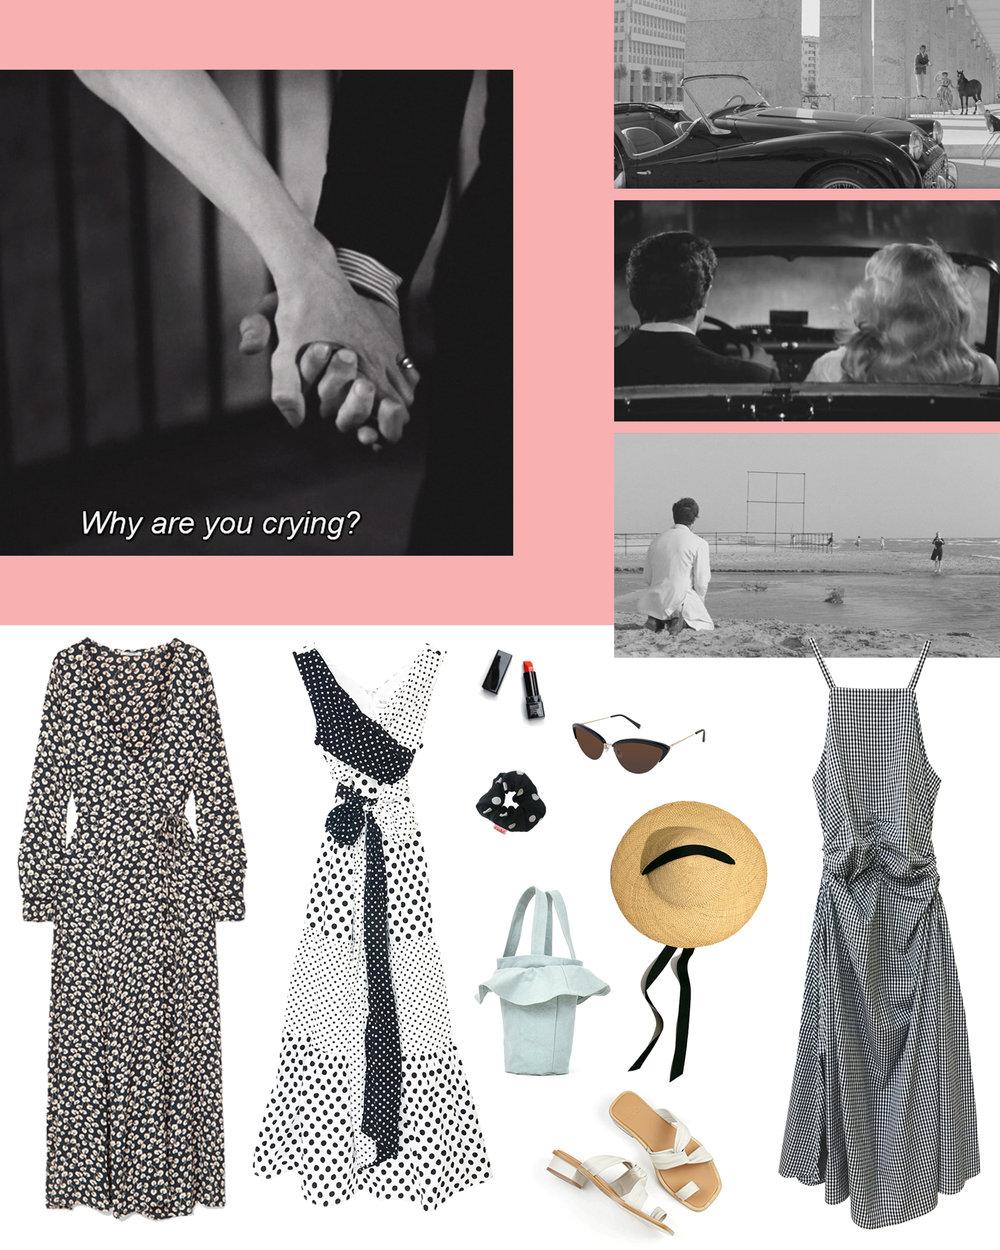 Lisa-Says-Gah-FilmFriday-La-Dolce-Vita-Collage.jpg